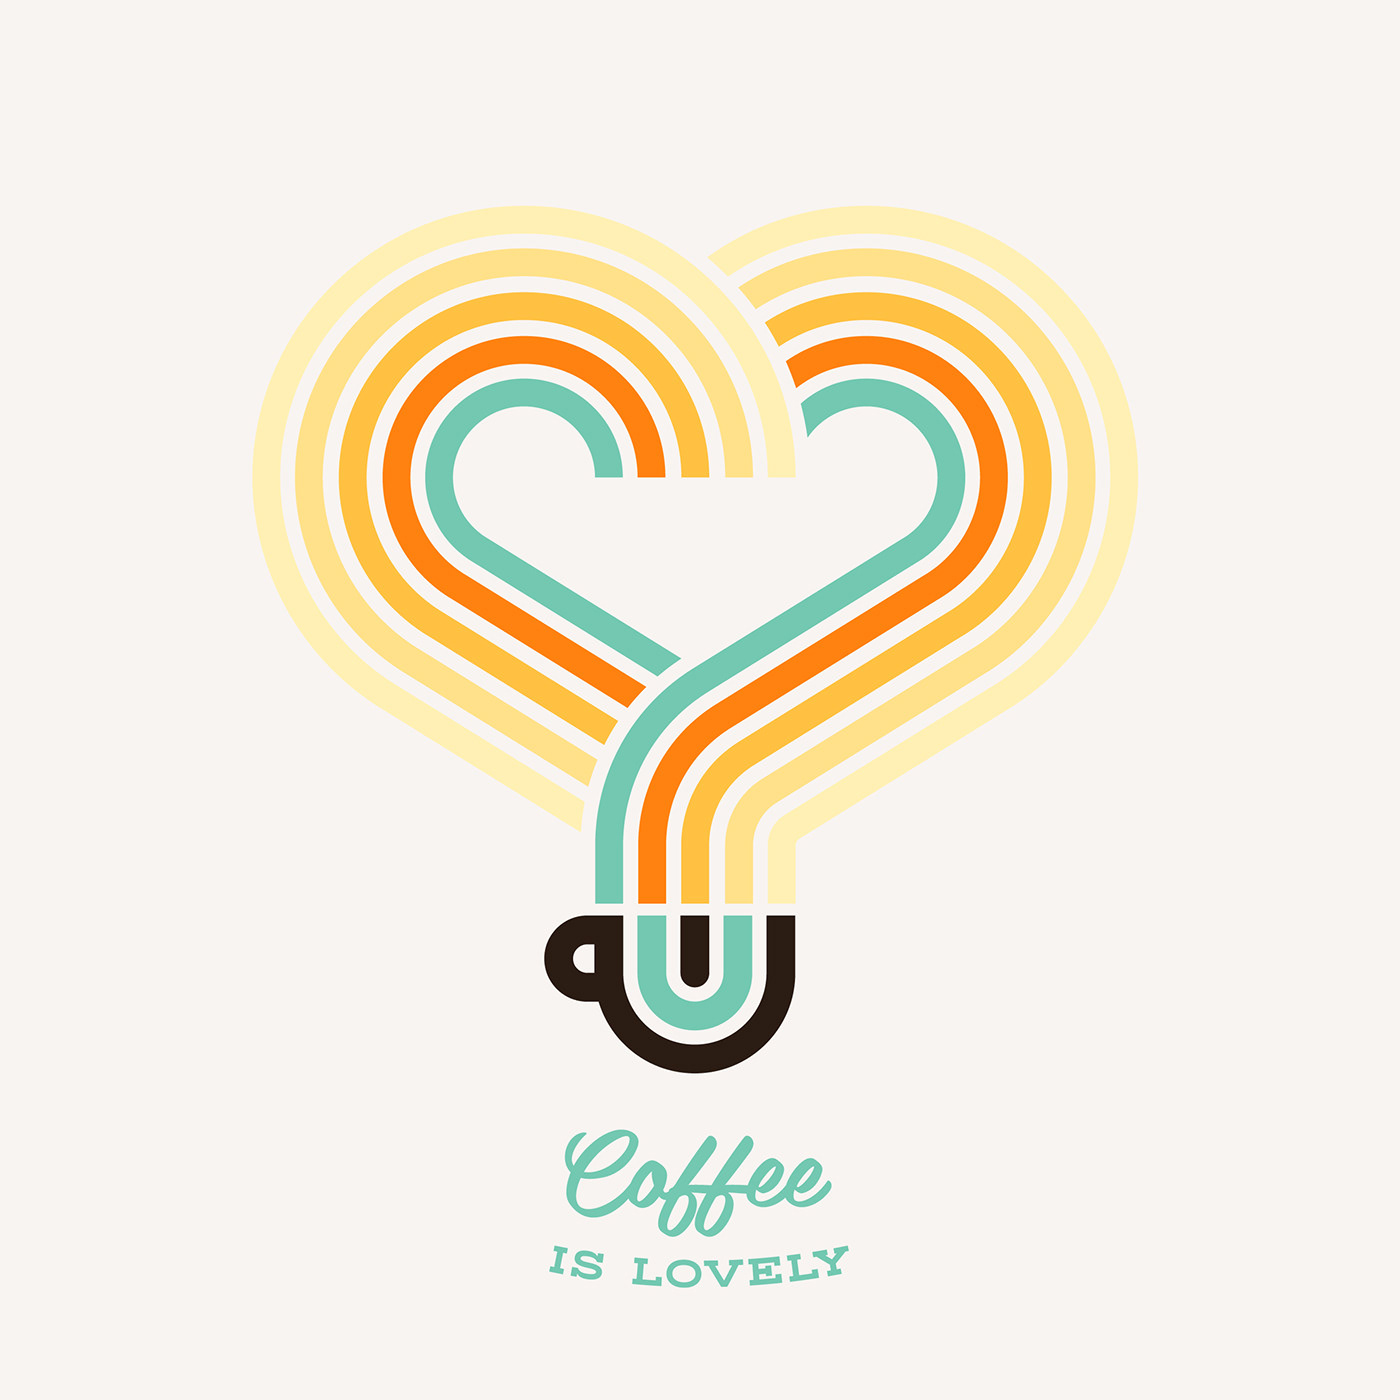 brand brand identity branding  Coffee coffee branding coffee logo logo logo designer Logo Designs logos